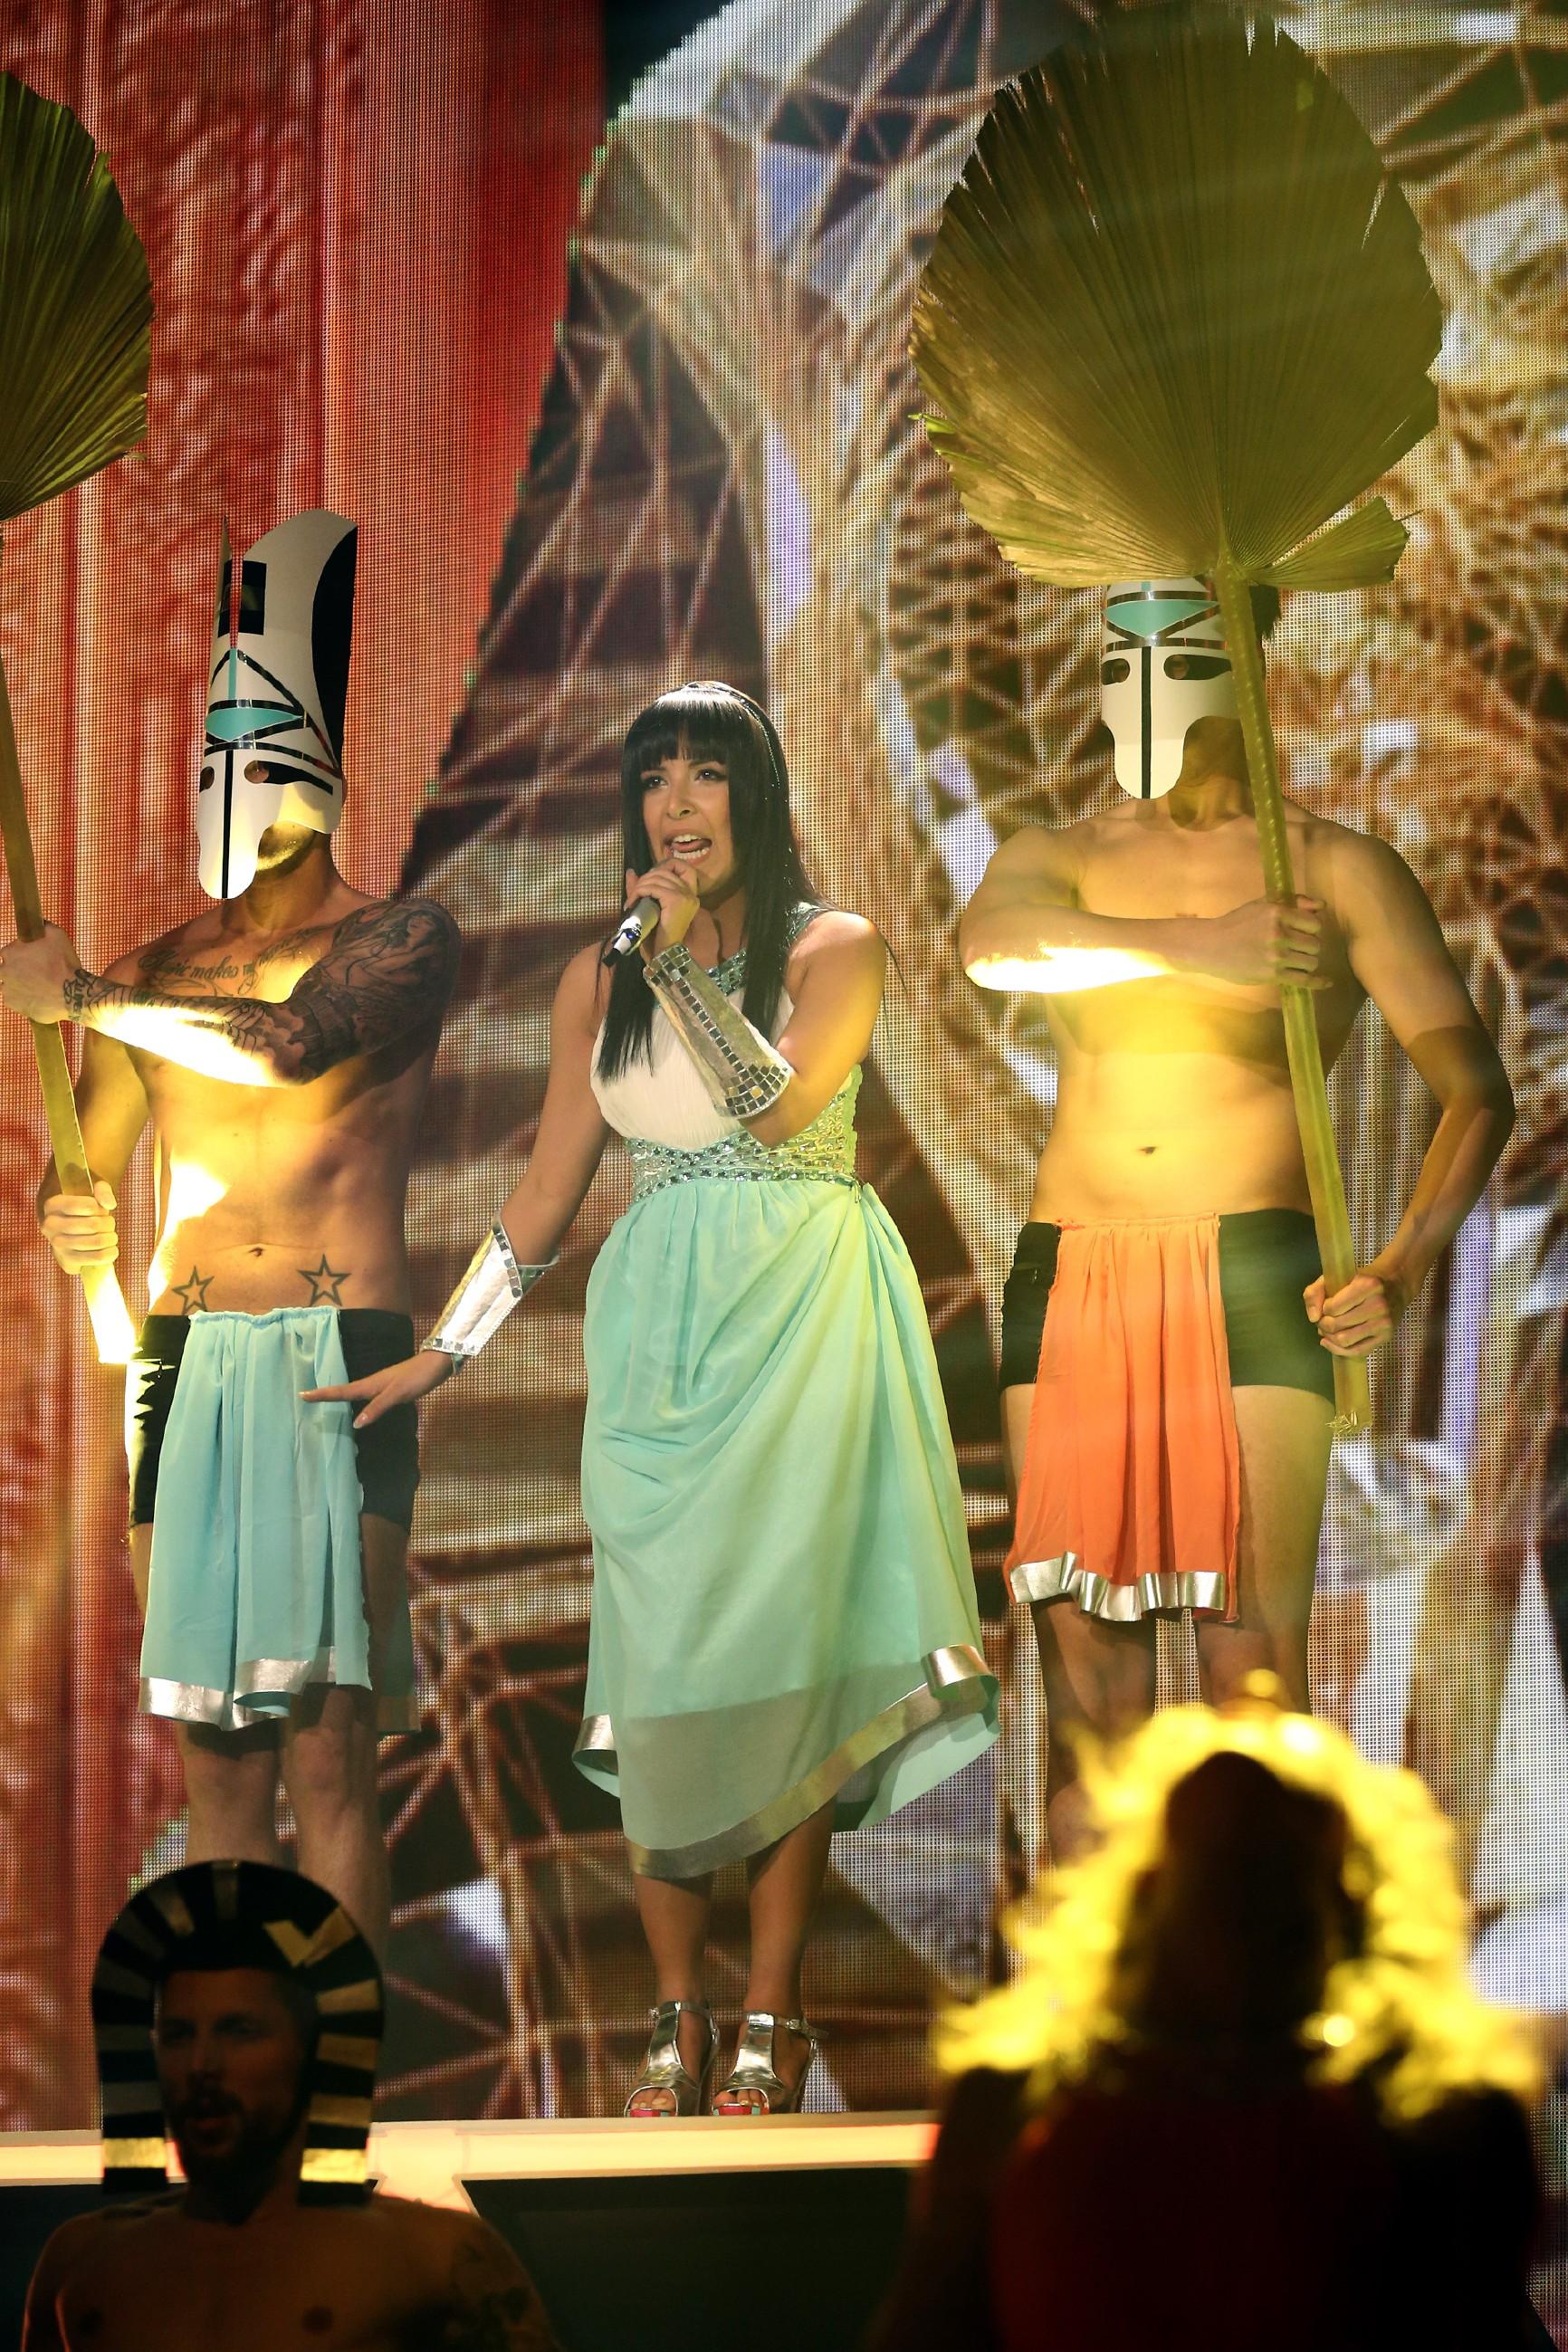 DSDS Finale 2014 - Meltem Acikgöz bei ihrem ersten Auftritt